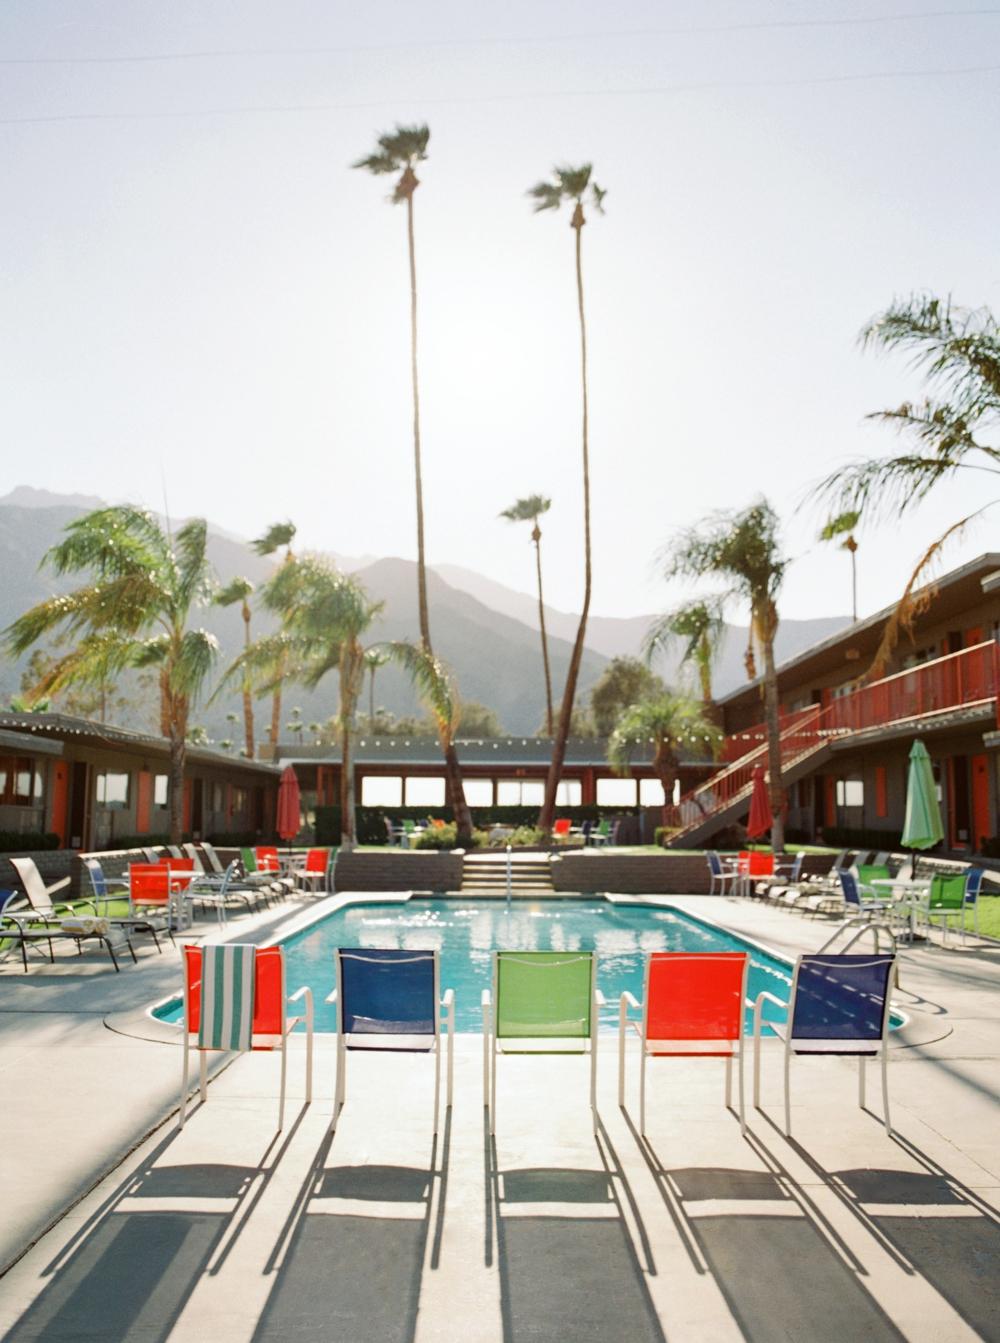 Skylark Hotel Palm Springs   California Photographer   Calgary Commercial and Advertising Photography   Hotel Photographers